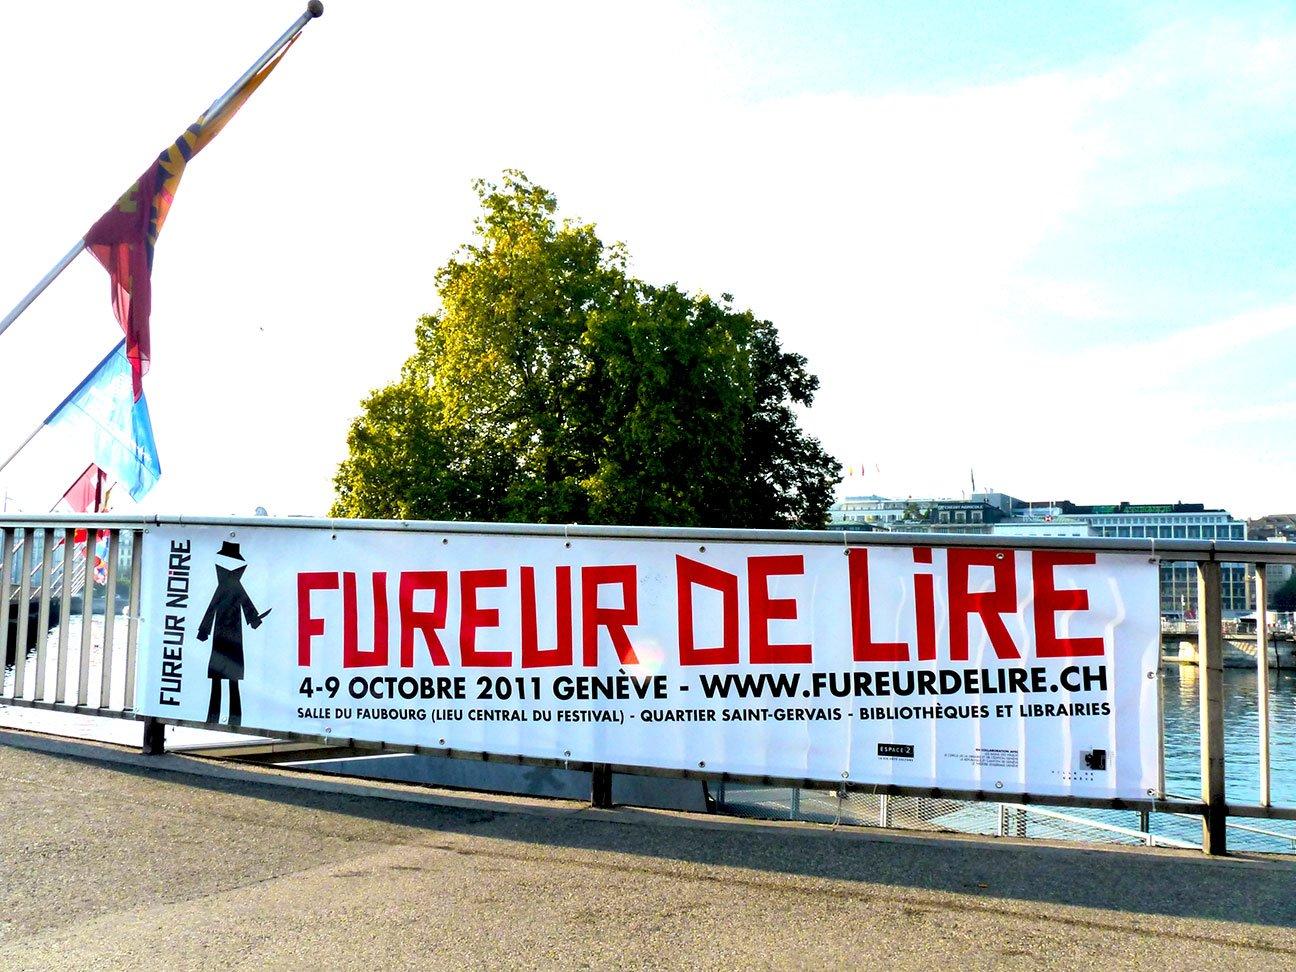 fabien_cuffel_festival_litteraire_fureur_lire_2011_siganletique_banderole